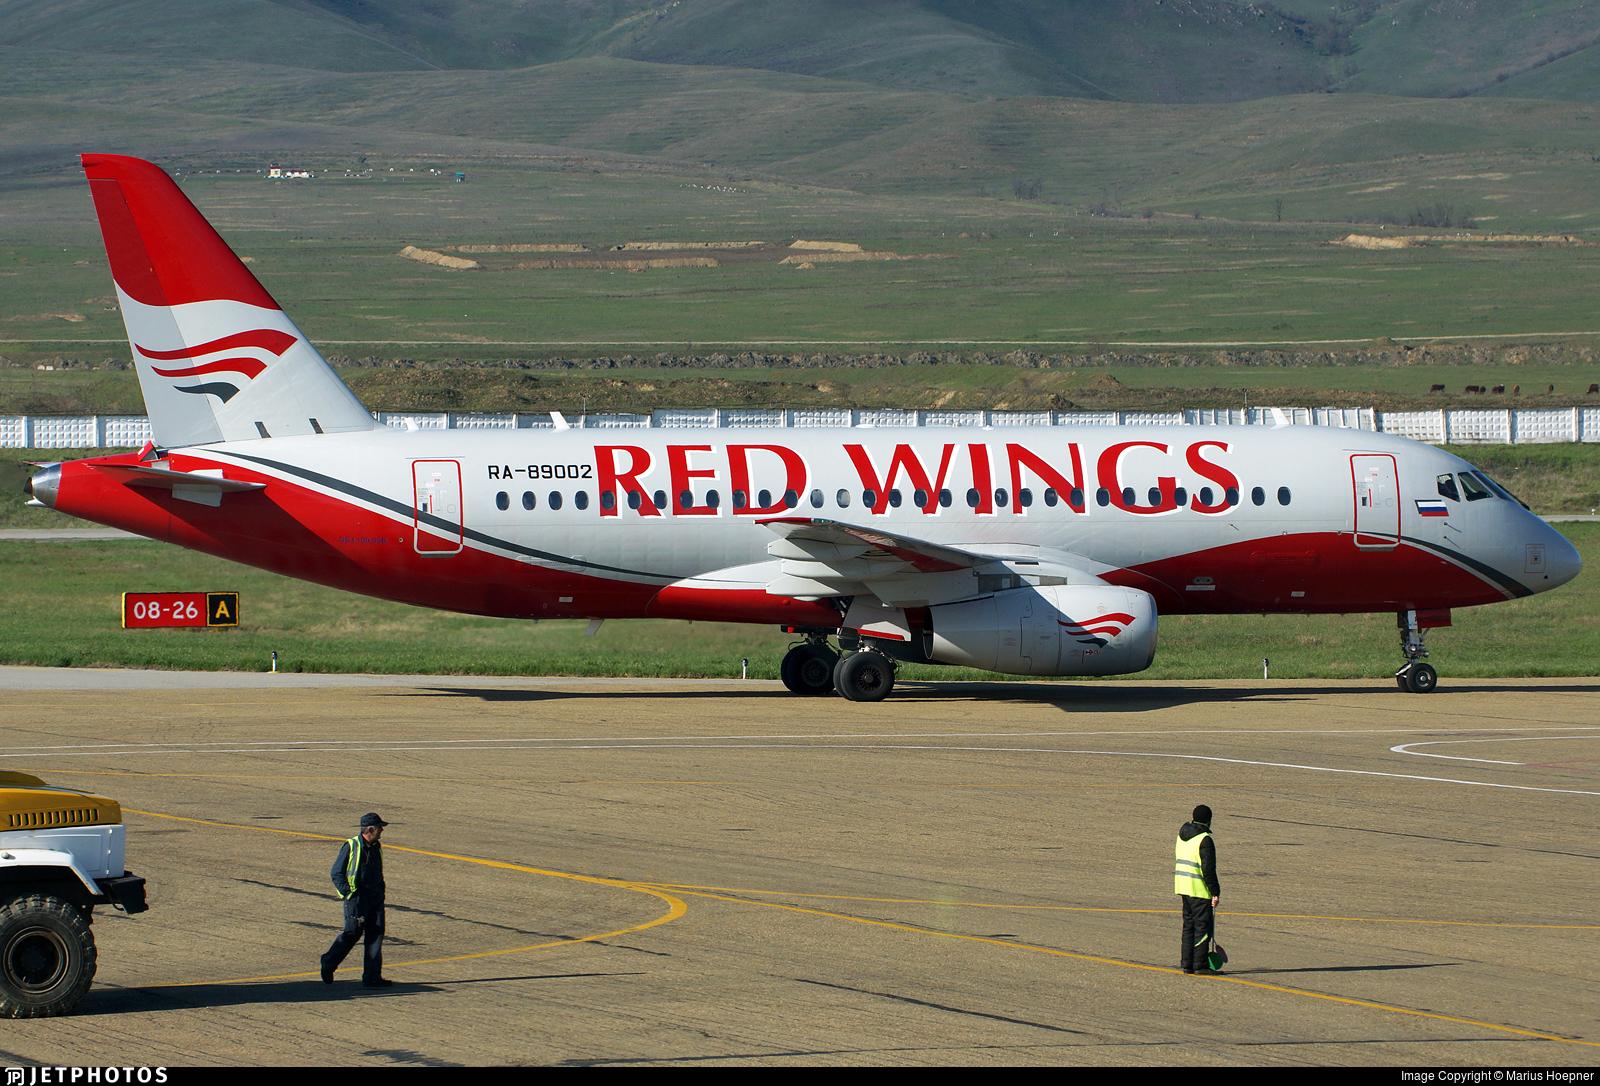 RA-89002 - Sukhoi Superjet 100-95B - Red Wings